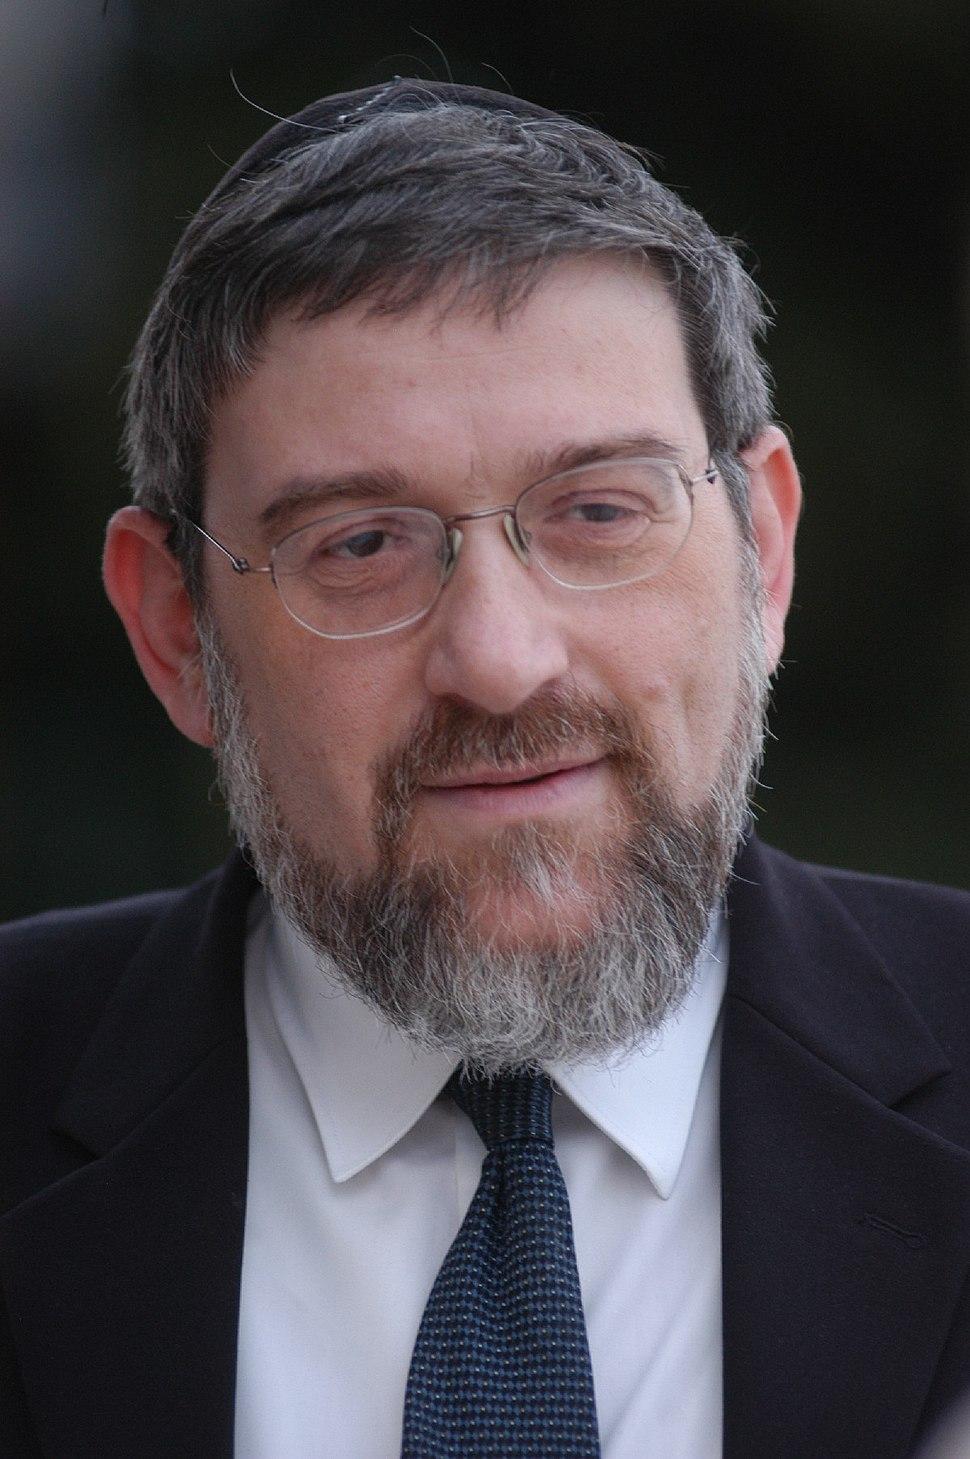 Rabbi Michael Melchior